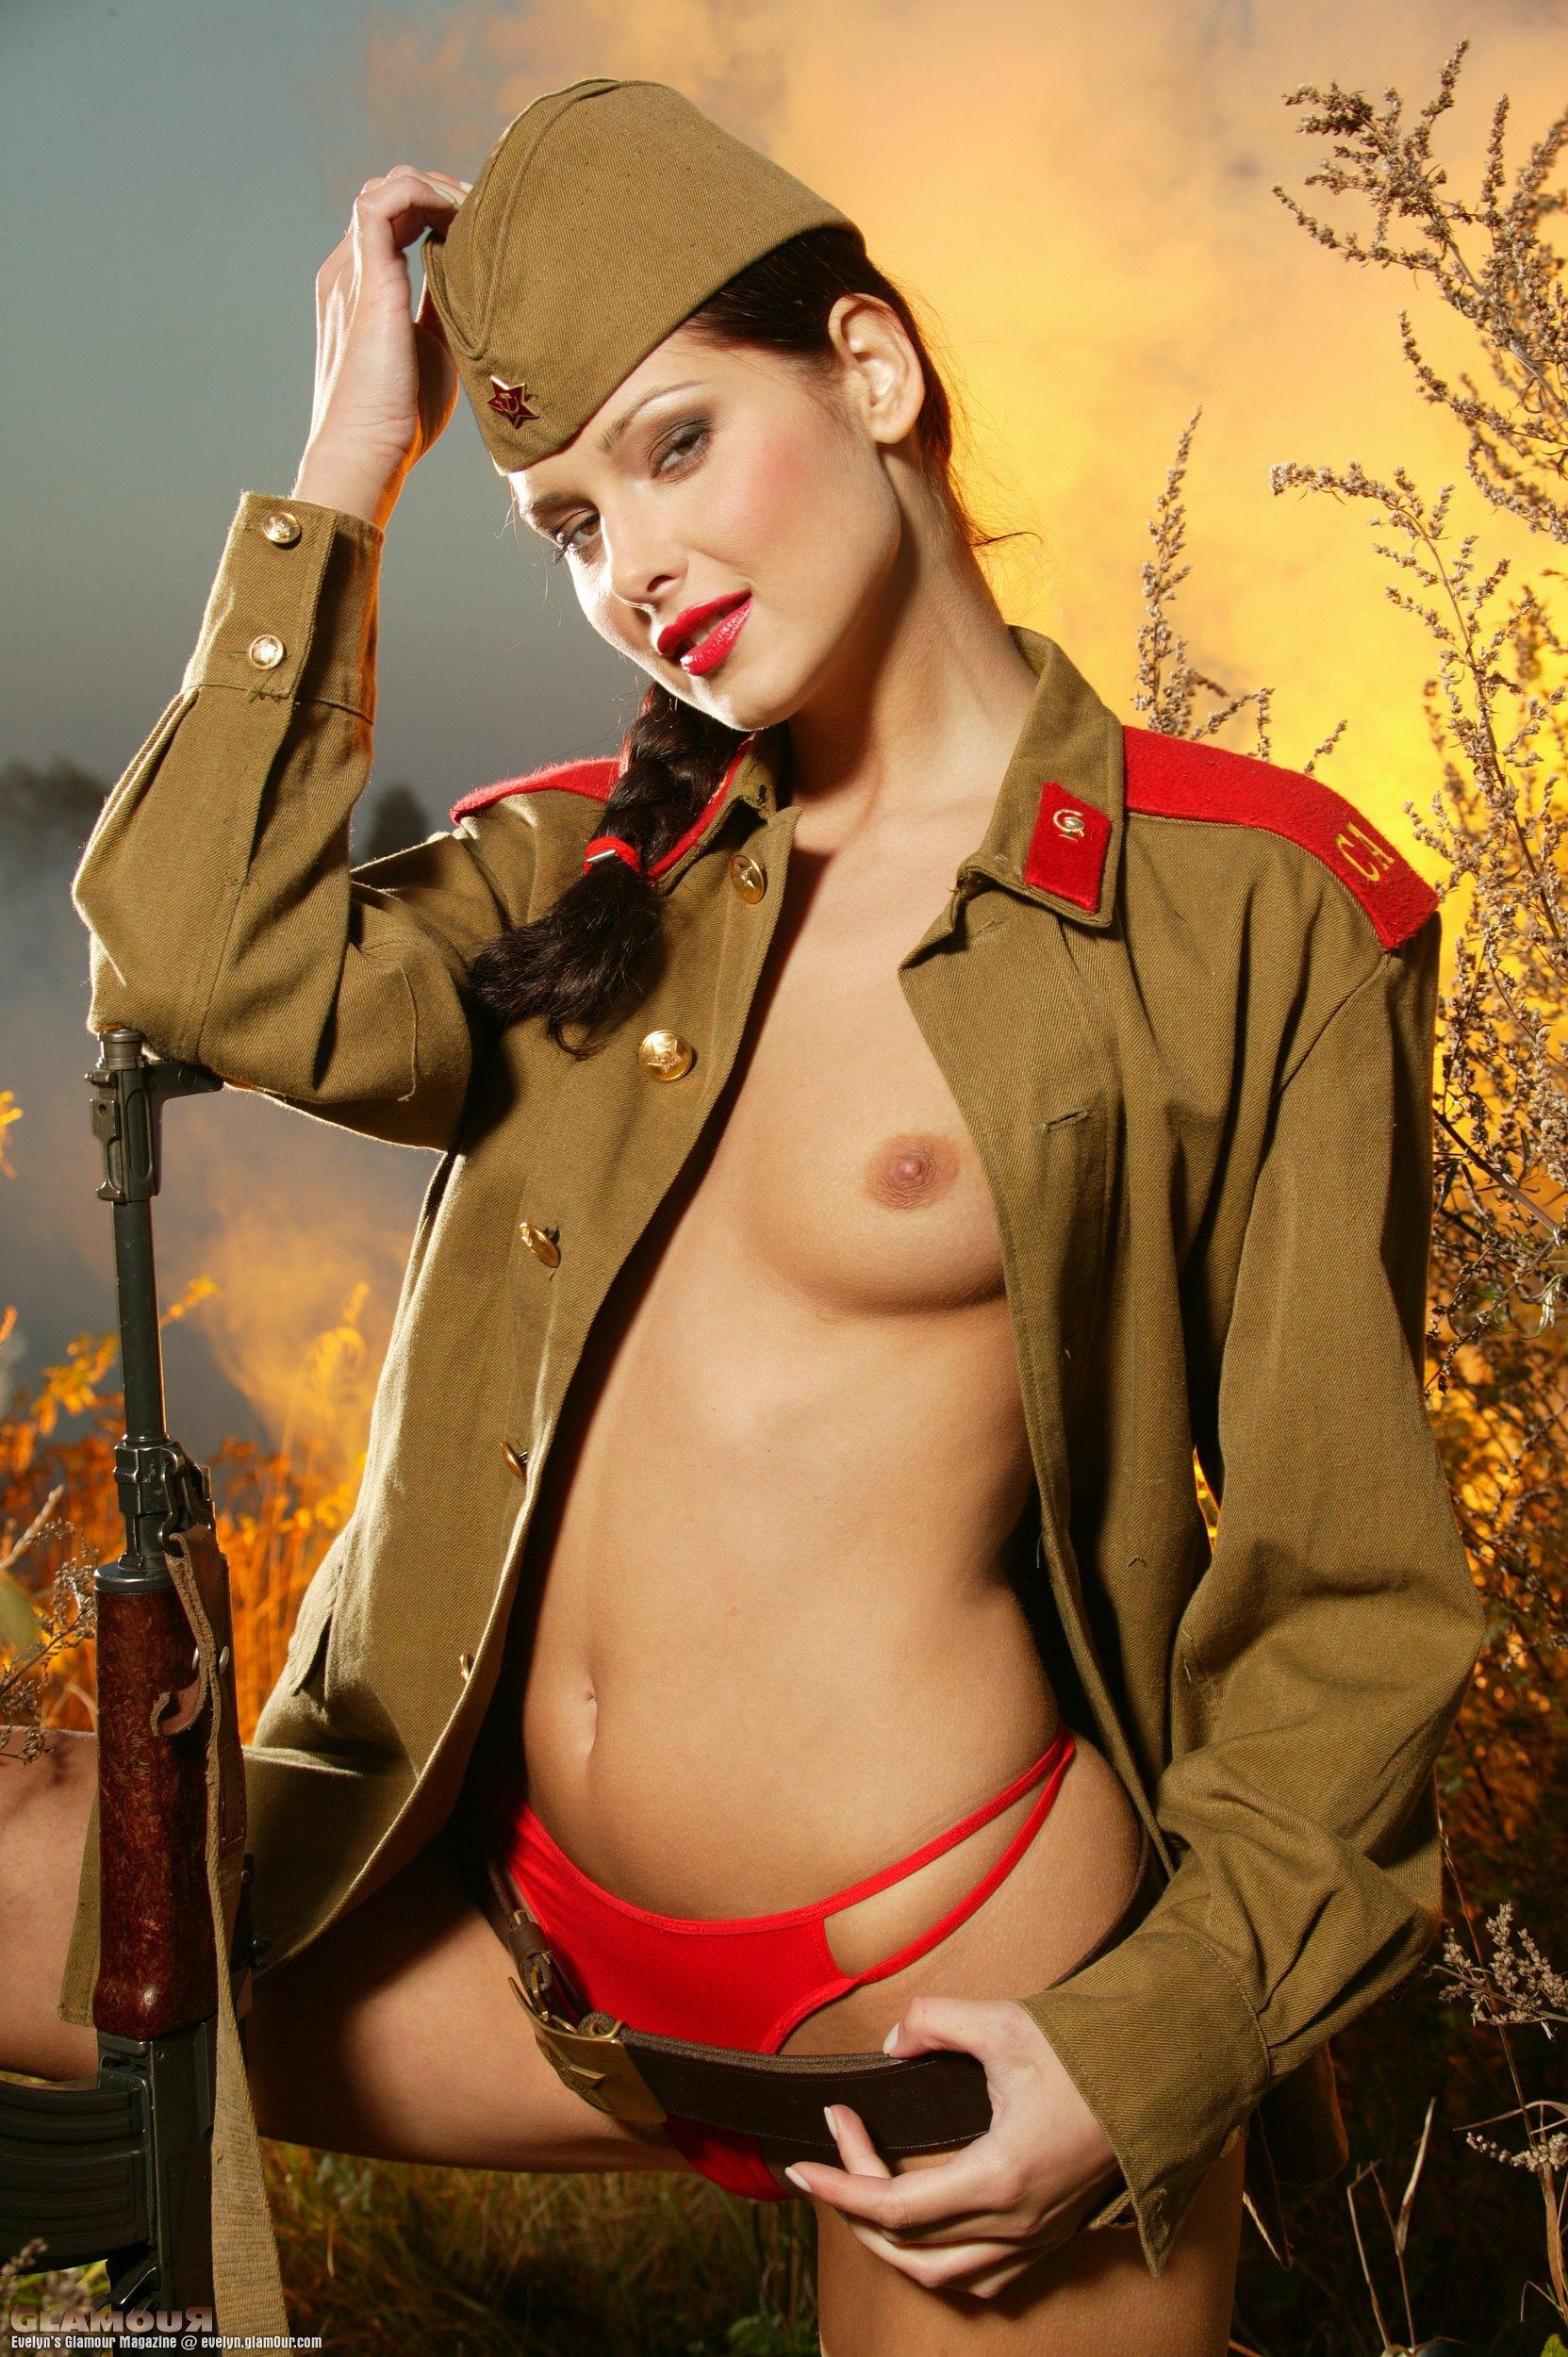 Sexy Schoolgirl Cosplay Role Play Costumes Night Women Uniform Erotic Costume